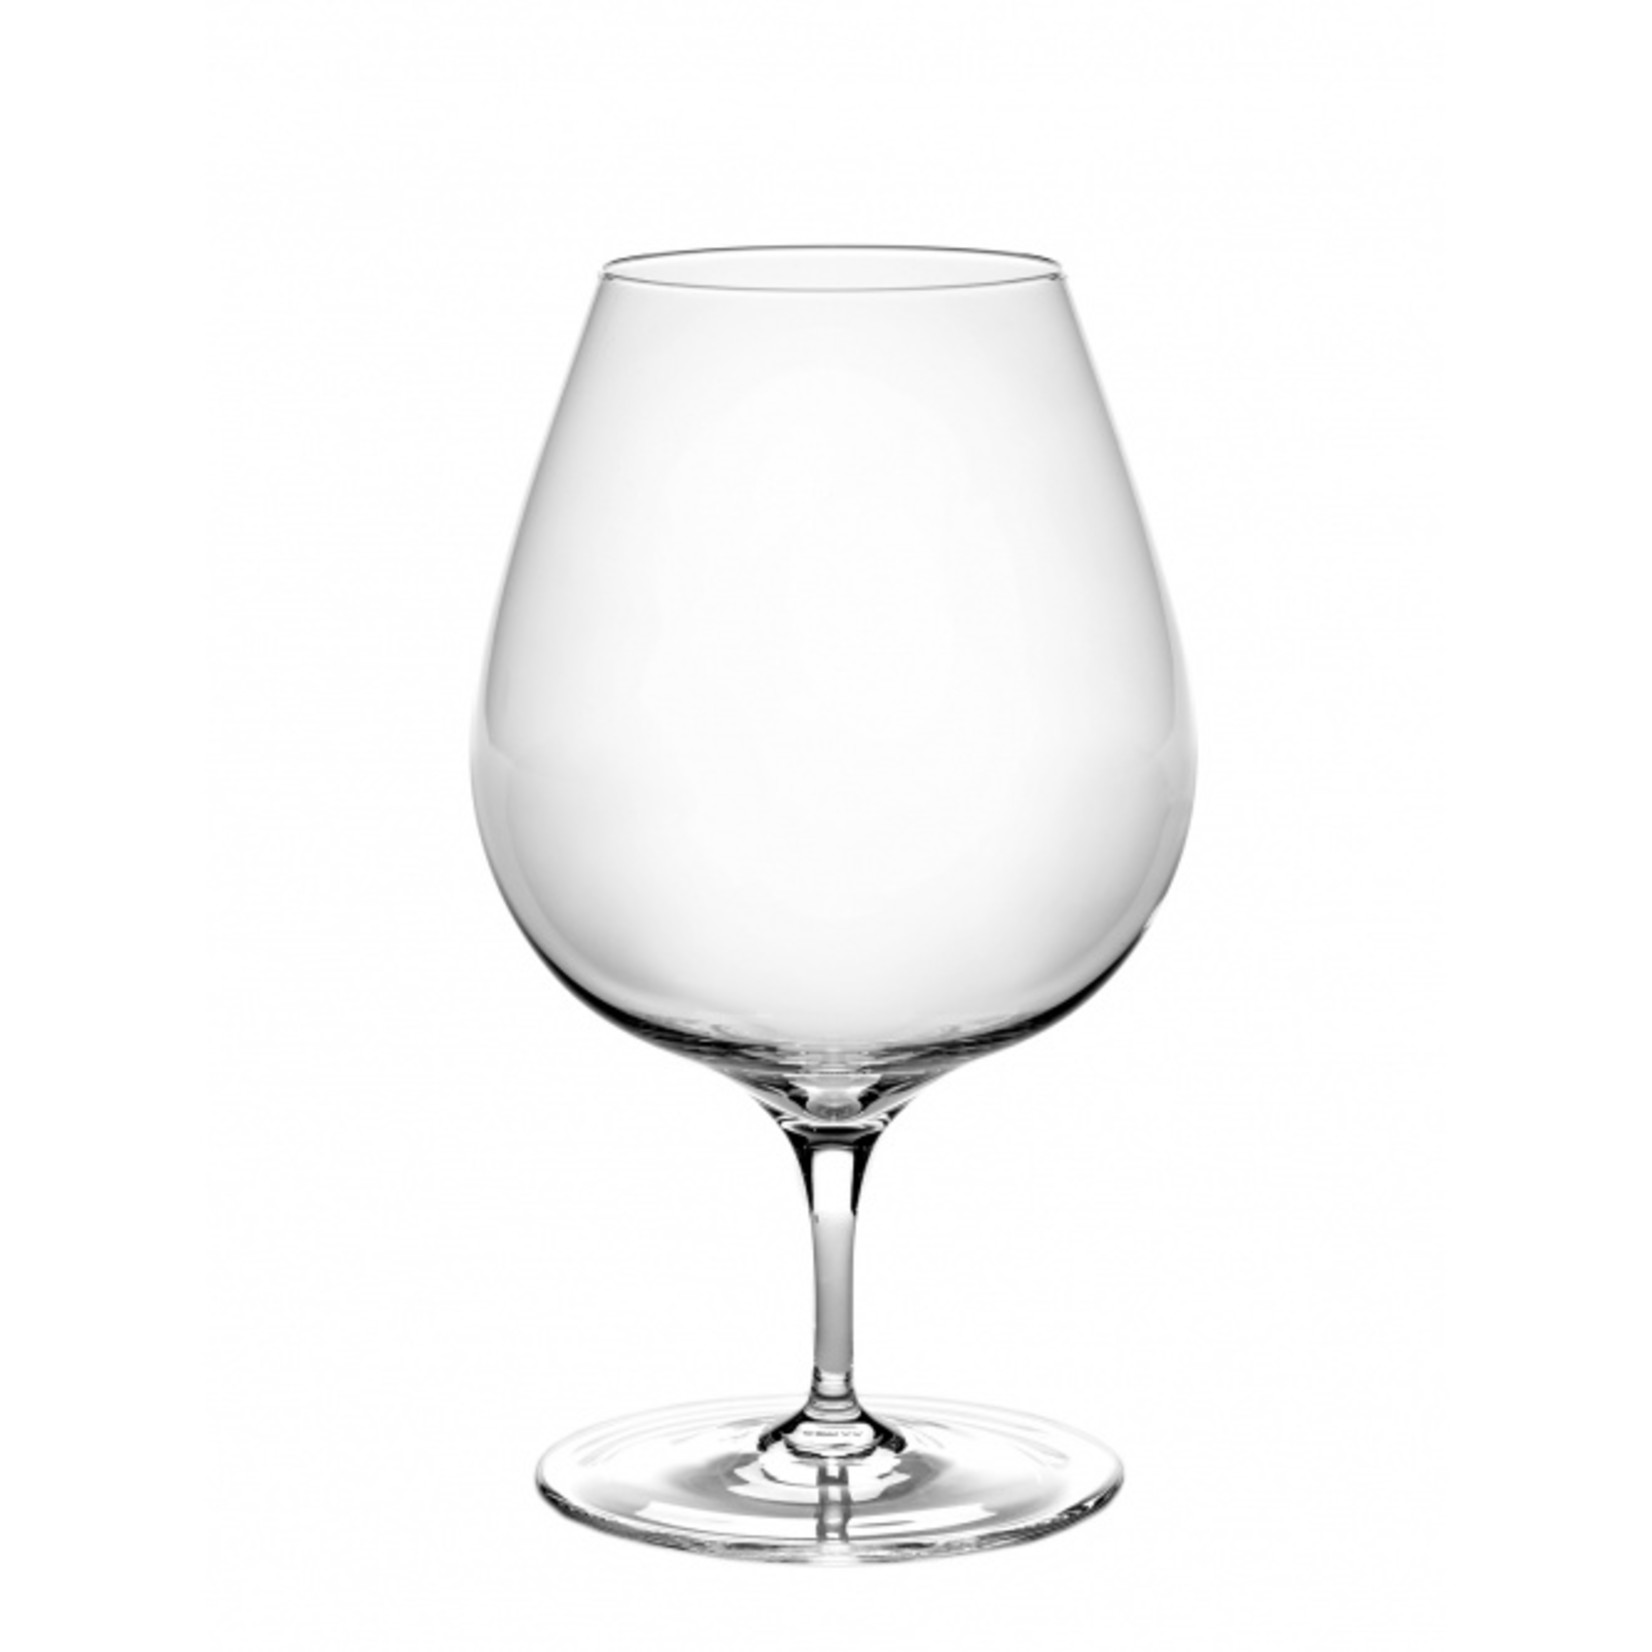 Sergio Herman Inku Wittewijn glas Inku